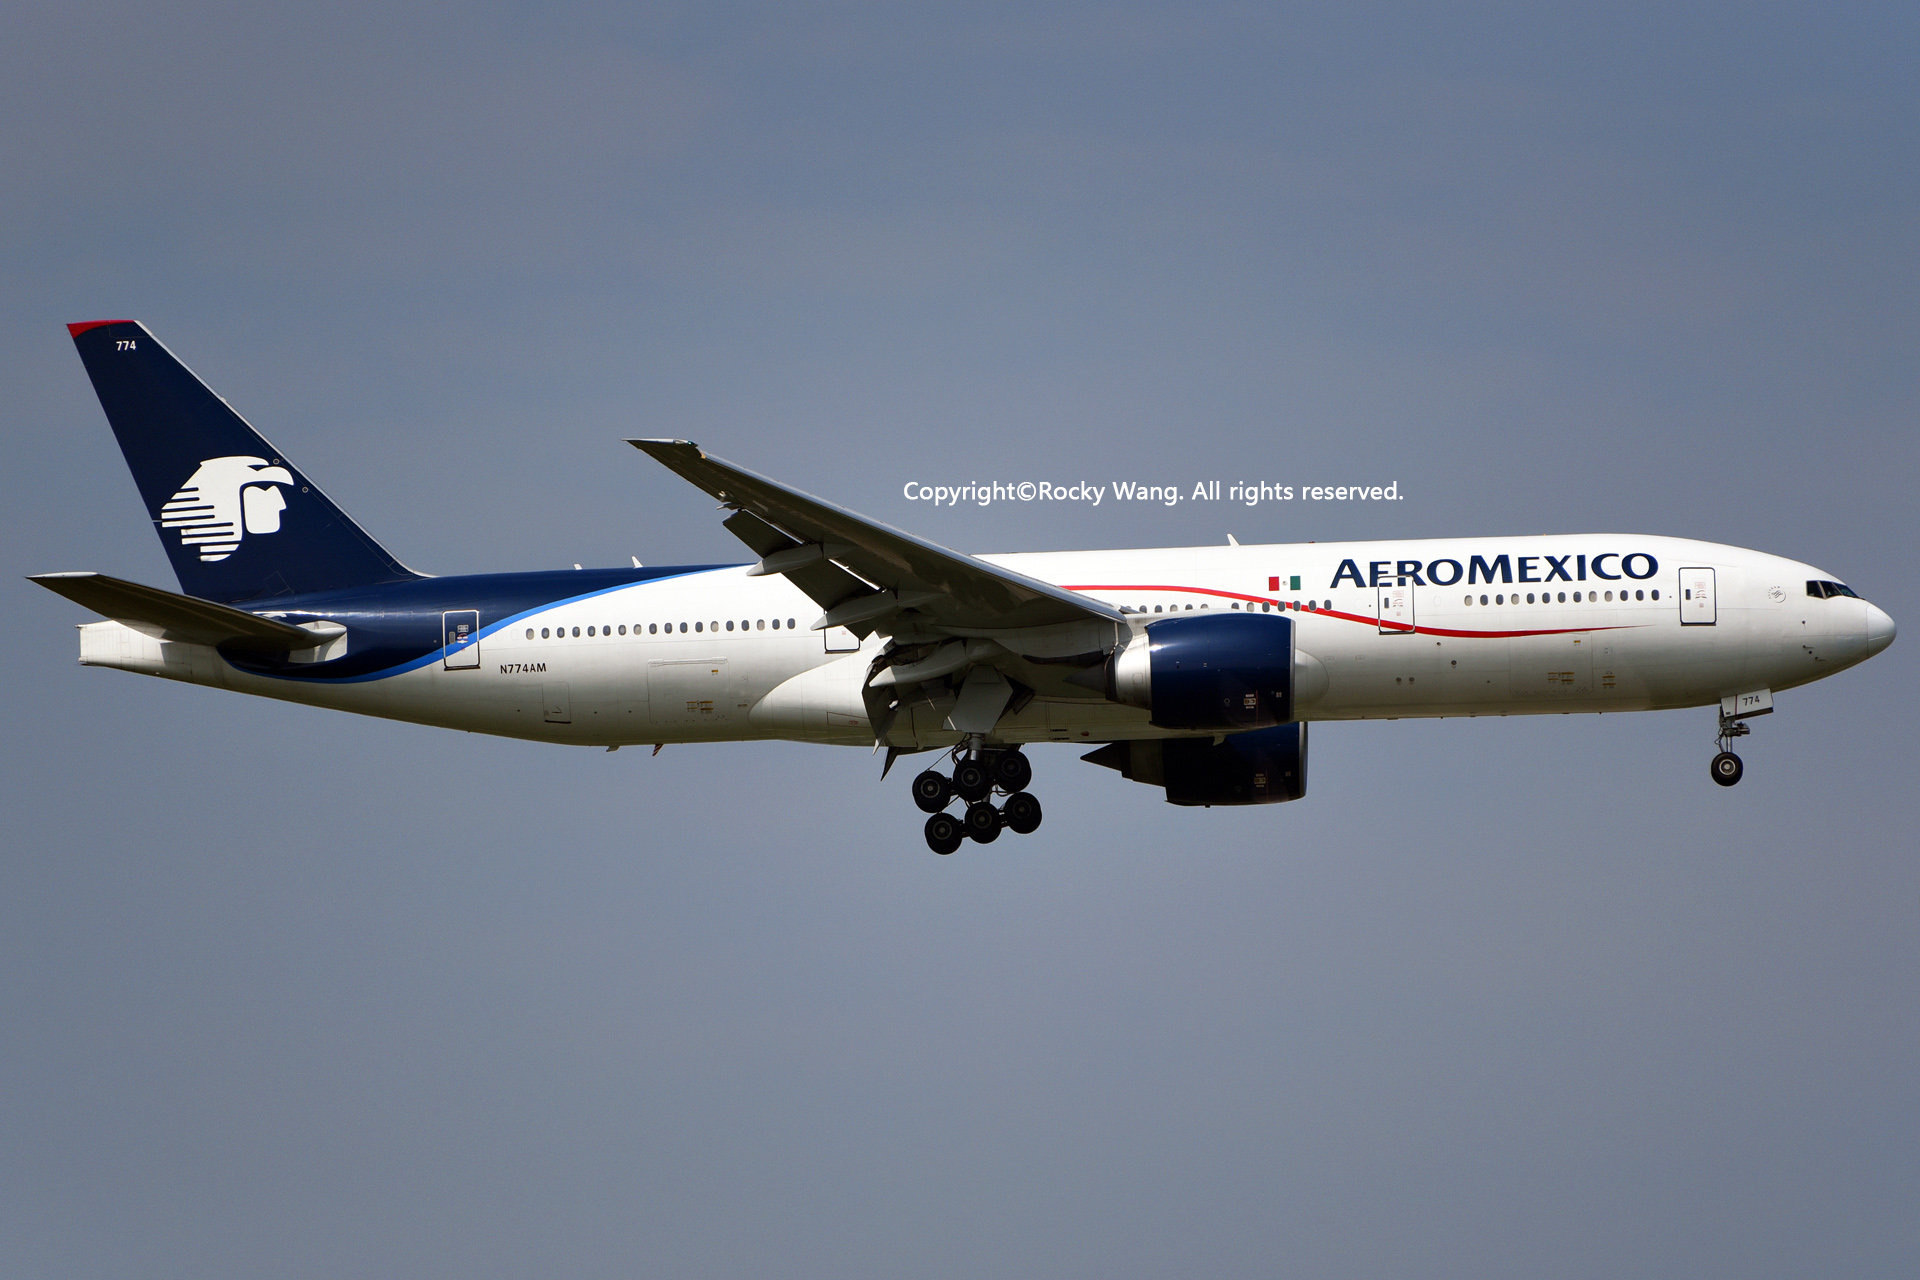 Re:[原创]居家了 批量处理老图 倾情奉献52家777 BOEING 777-2Q8(ER) N774AM Shanghai Pudong